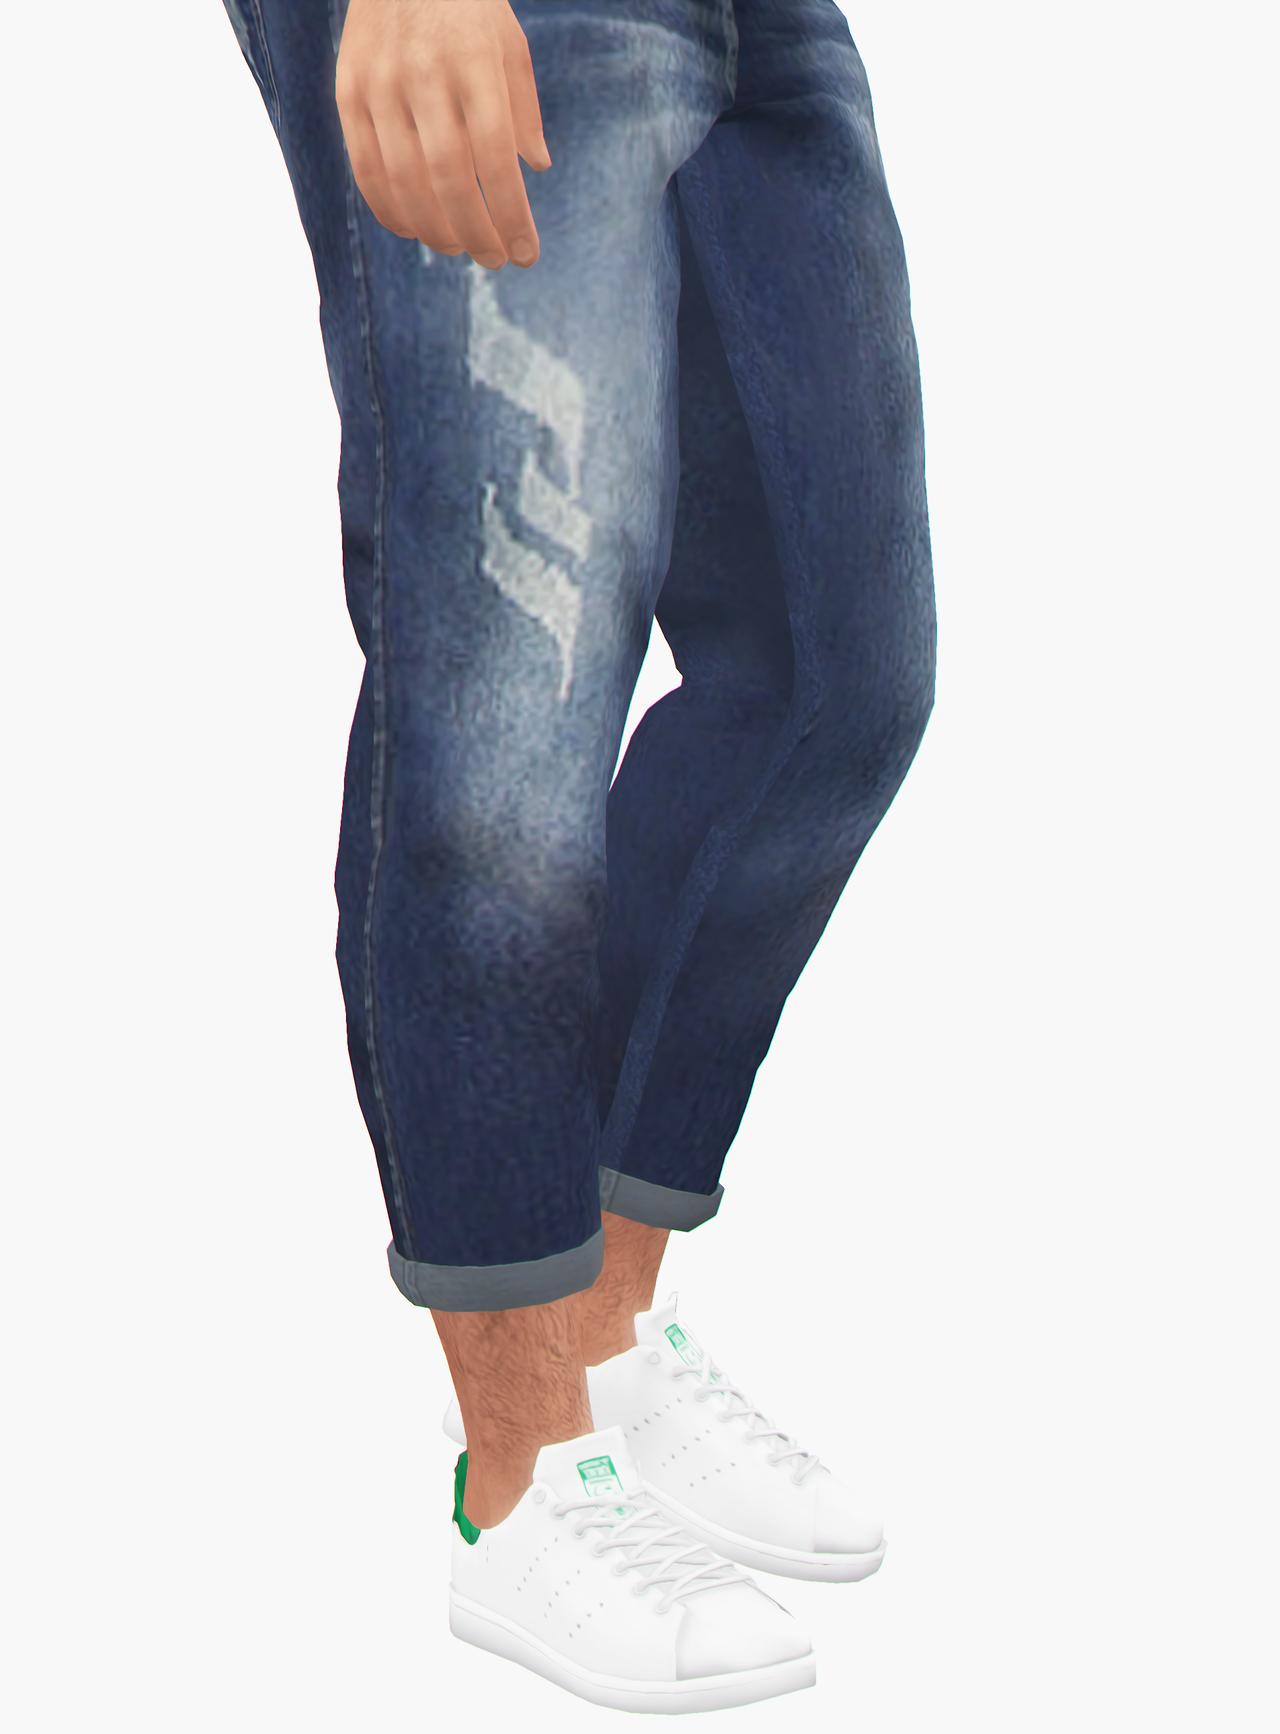 owl plumbob adidas stan smith a sims 4 cc pinterest adidas